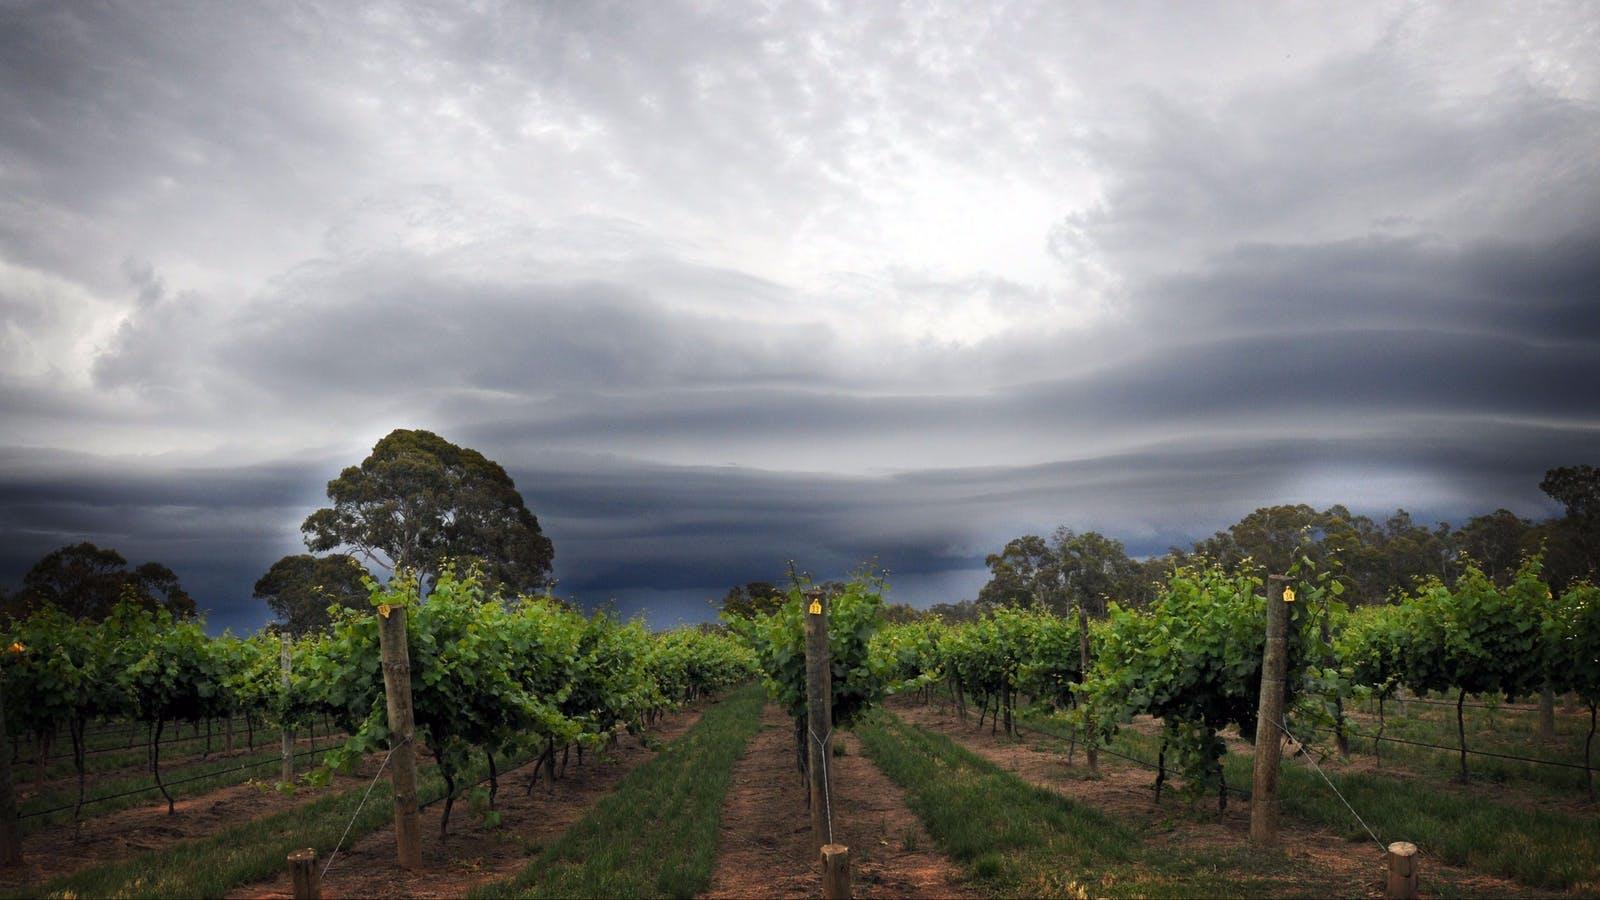 View across Tahbilk vineyards